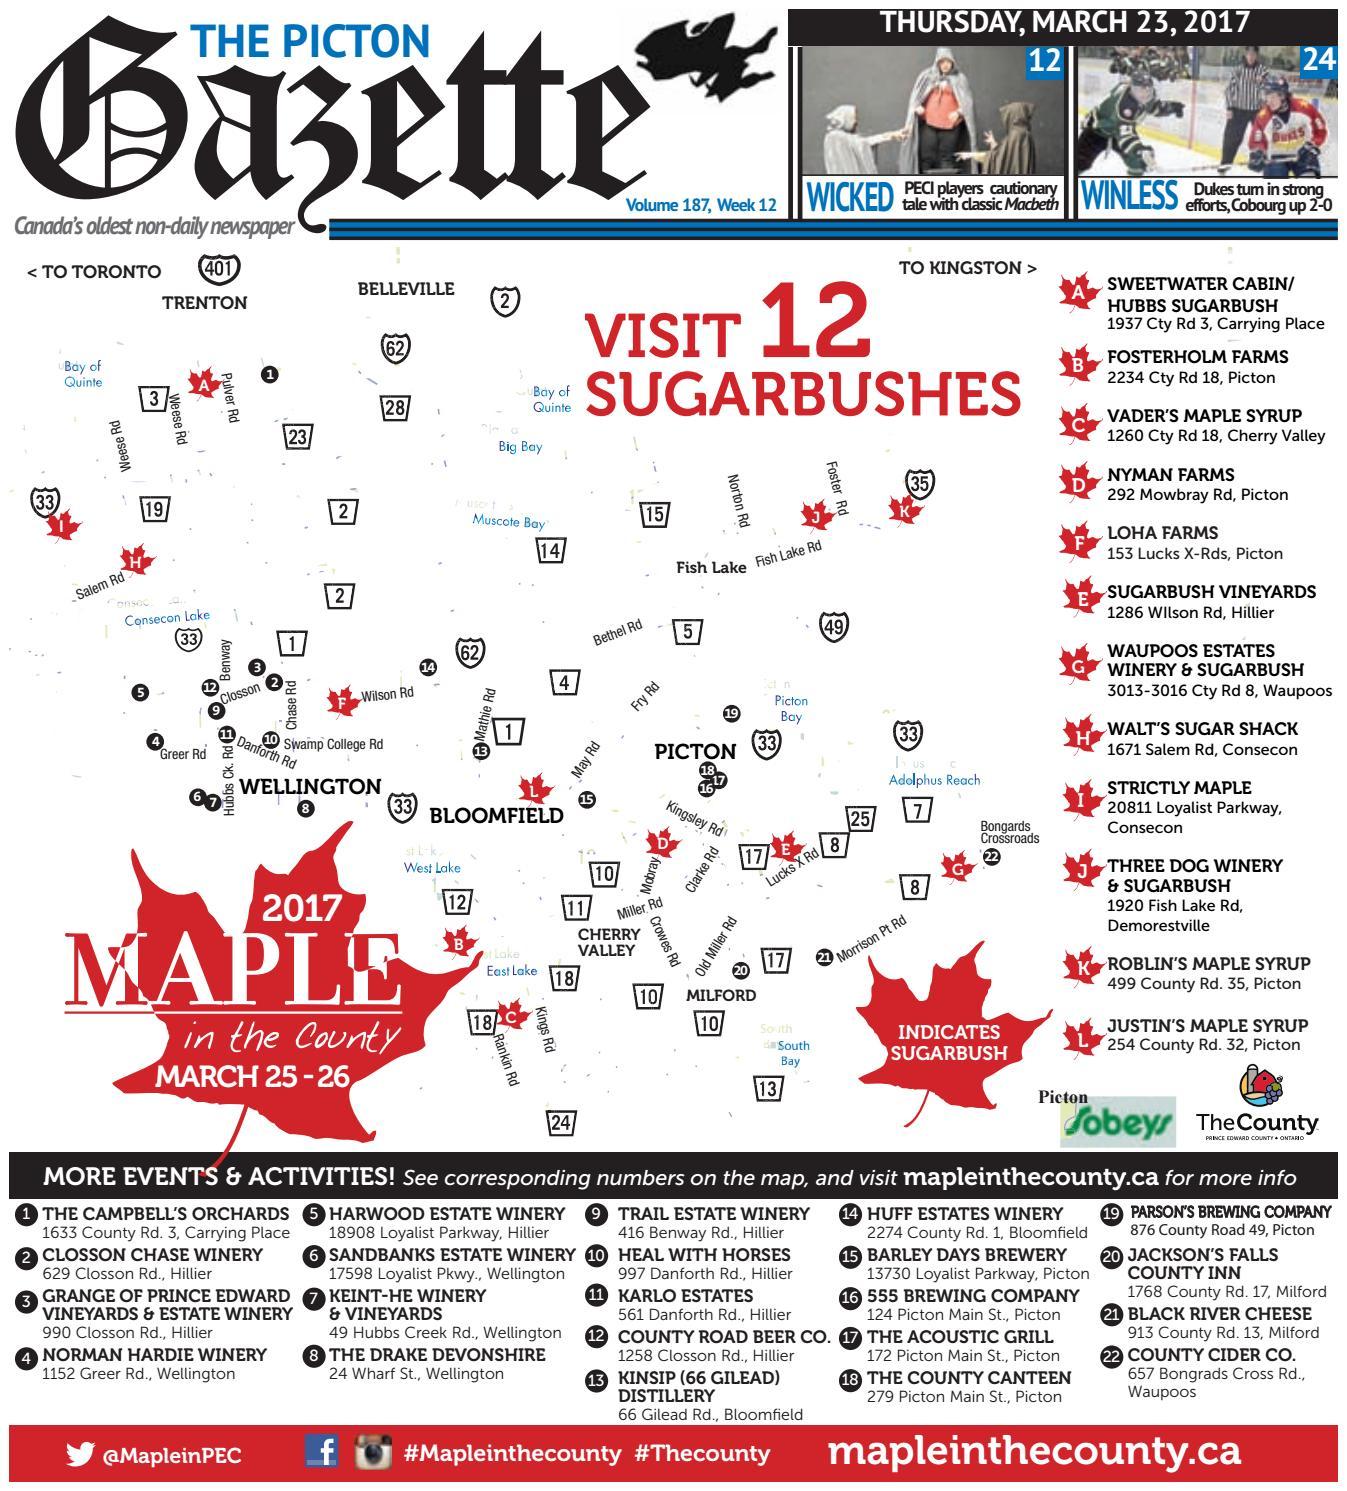 picton gazette march 23 2017 by the picton gazette issuu